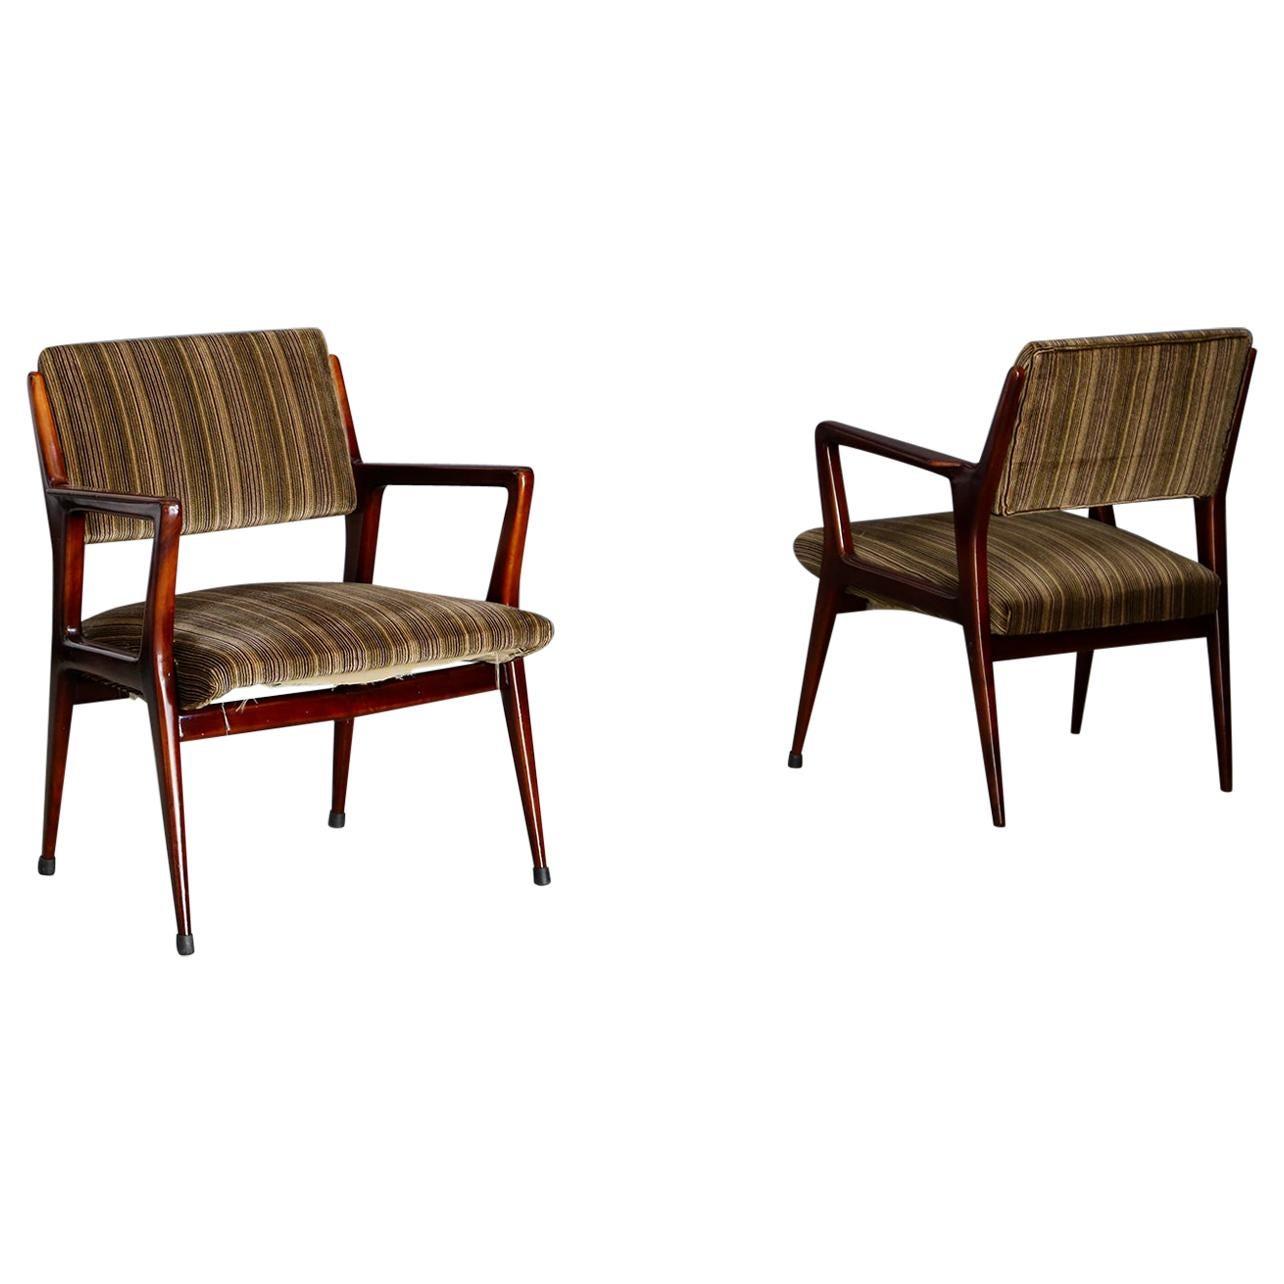 Pair of Midcentury Armchairs Attributed to Gio Ponti in Original Velvet, 1950s